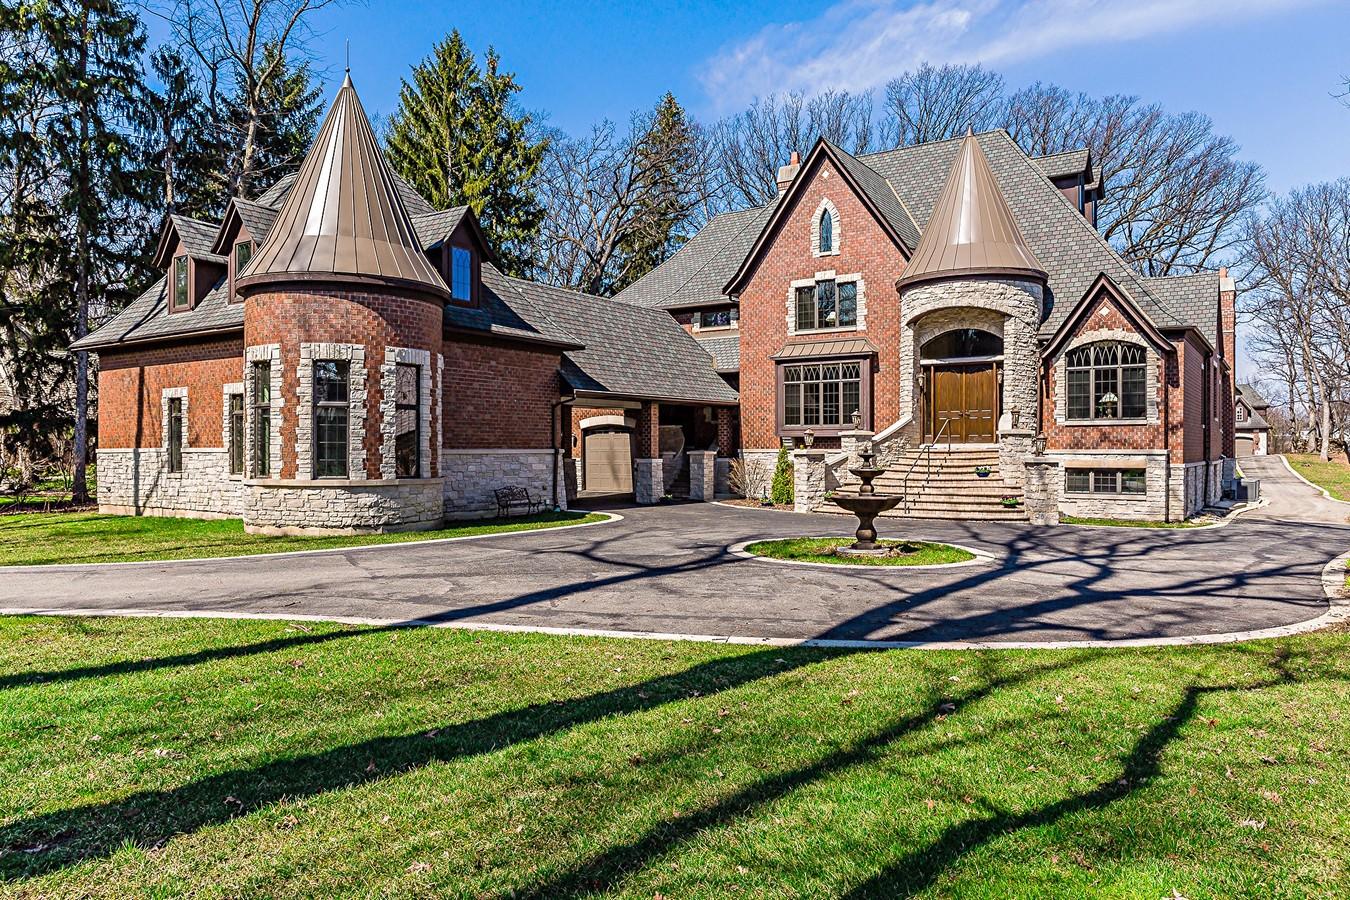 Casa Unifamiliar por un Venta en 3108 White Oak Ln 3108 White Oak Lane Oak Brook, Illinois, 60523 Estados Unidos